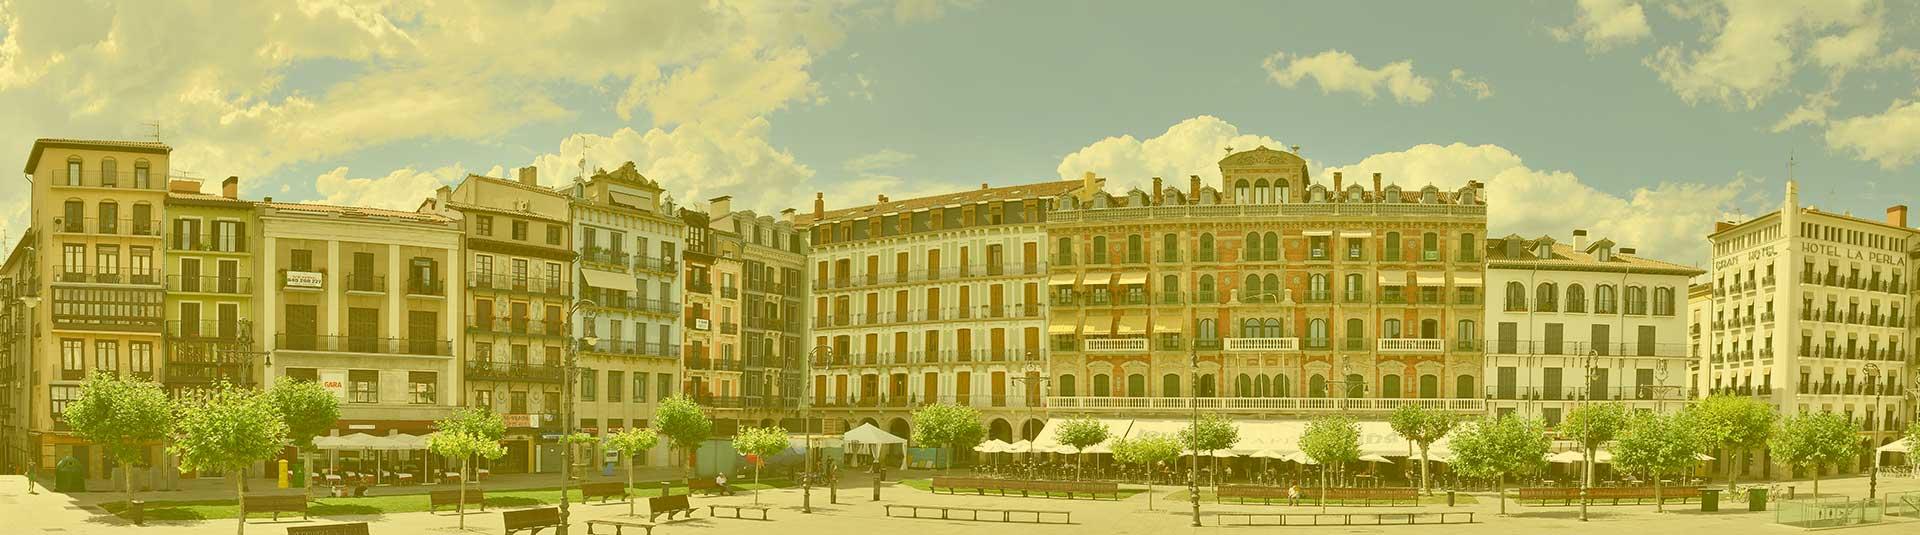 Agencia de marketing online Pamplona